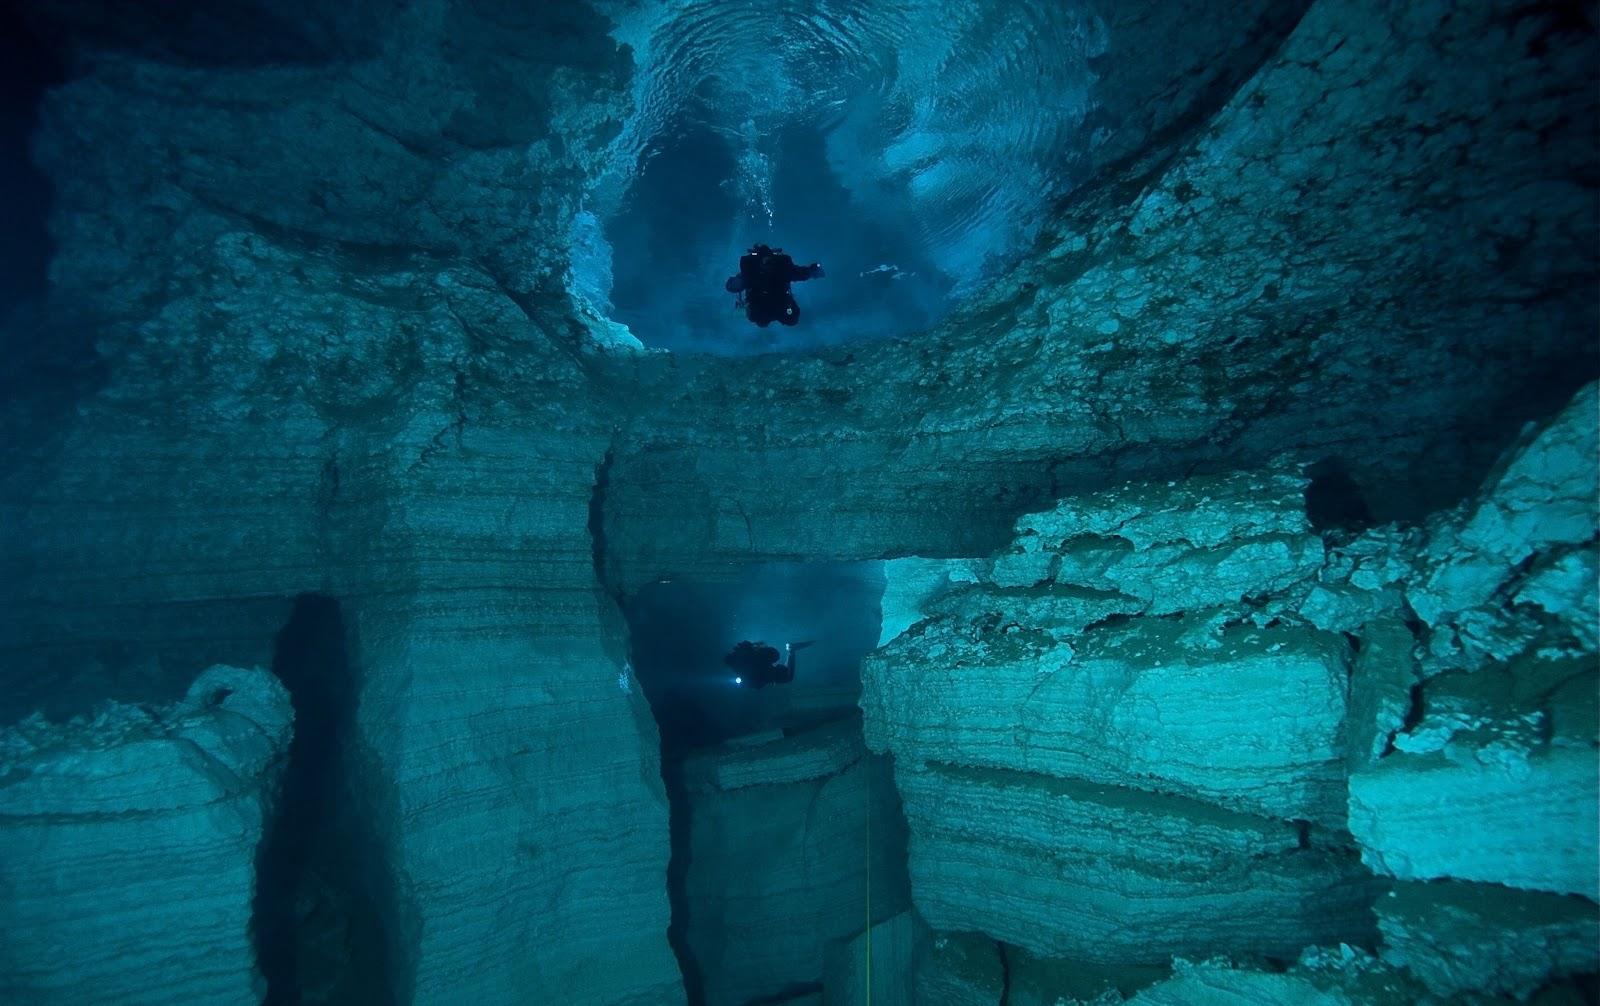 http://4.bp.blogspot.com/-r27yE4bWPhE/UMJQRQ-pbsI/AAAAAAAAD3E/dTfEggGQjXk/s1600/orda_cave_pictures_2.jpg